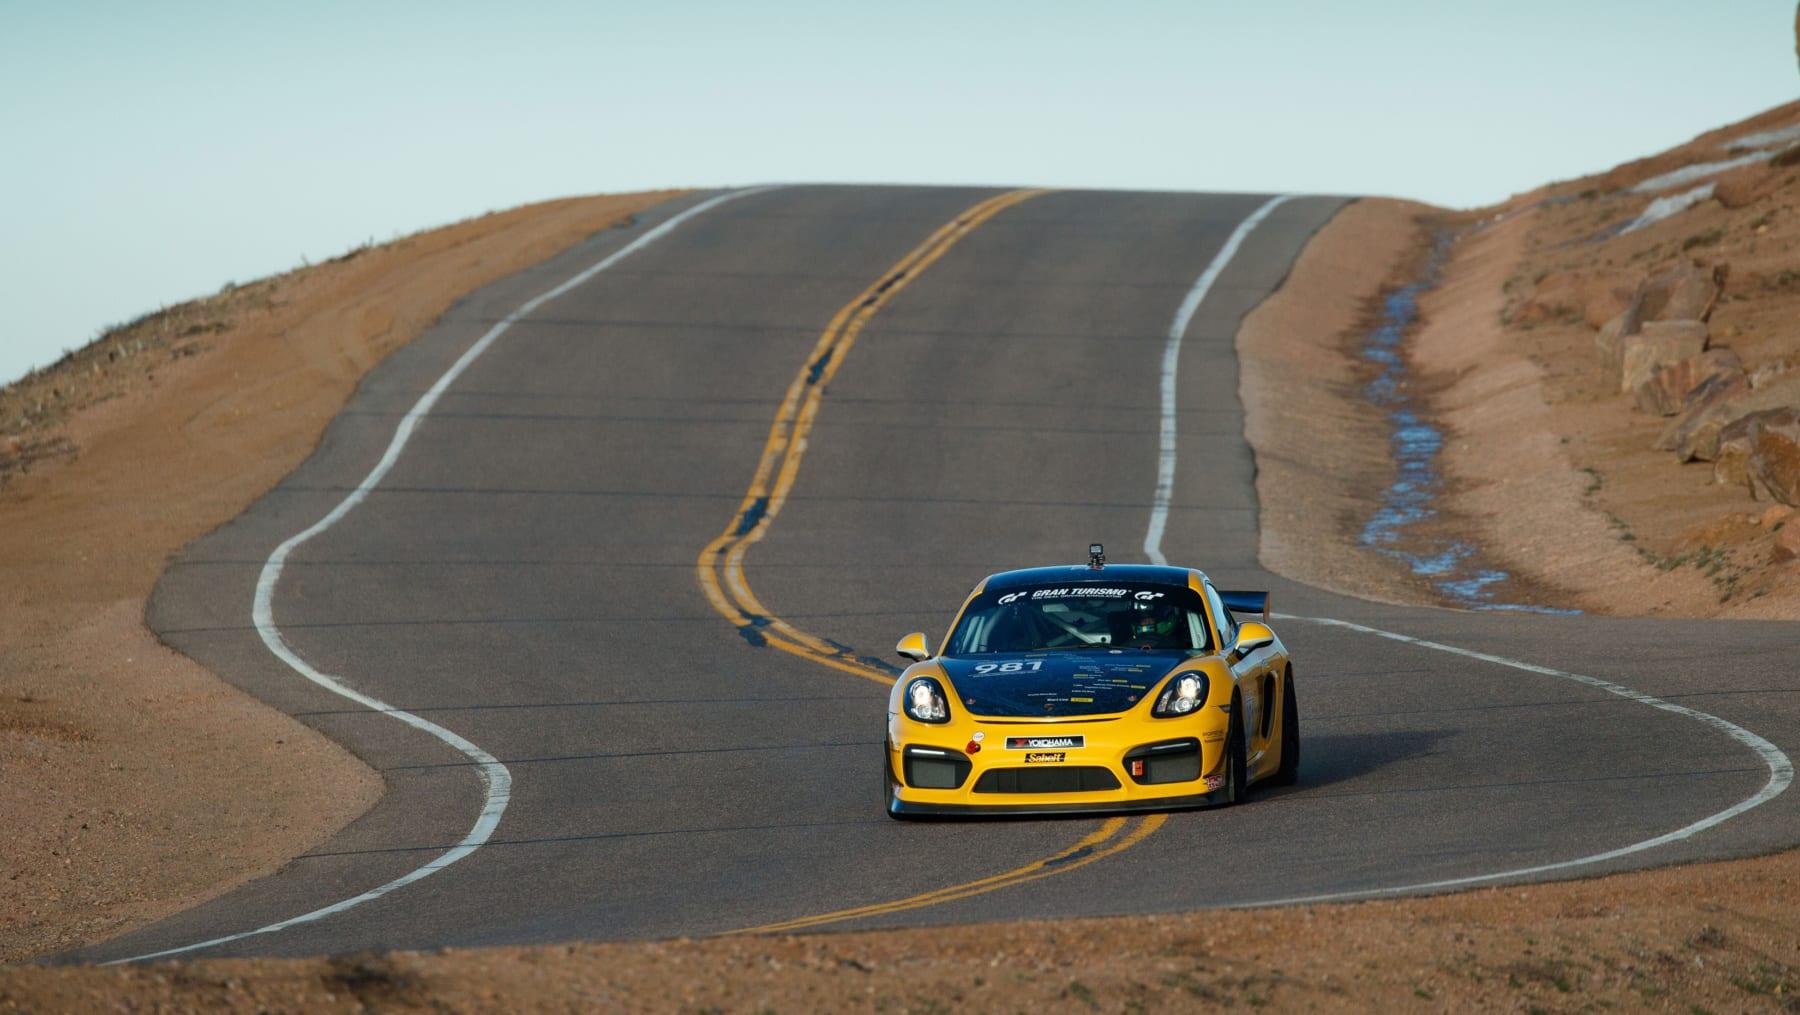 Porsche Cayman GT4 Clubsport at Pikes Peak